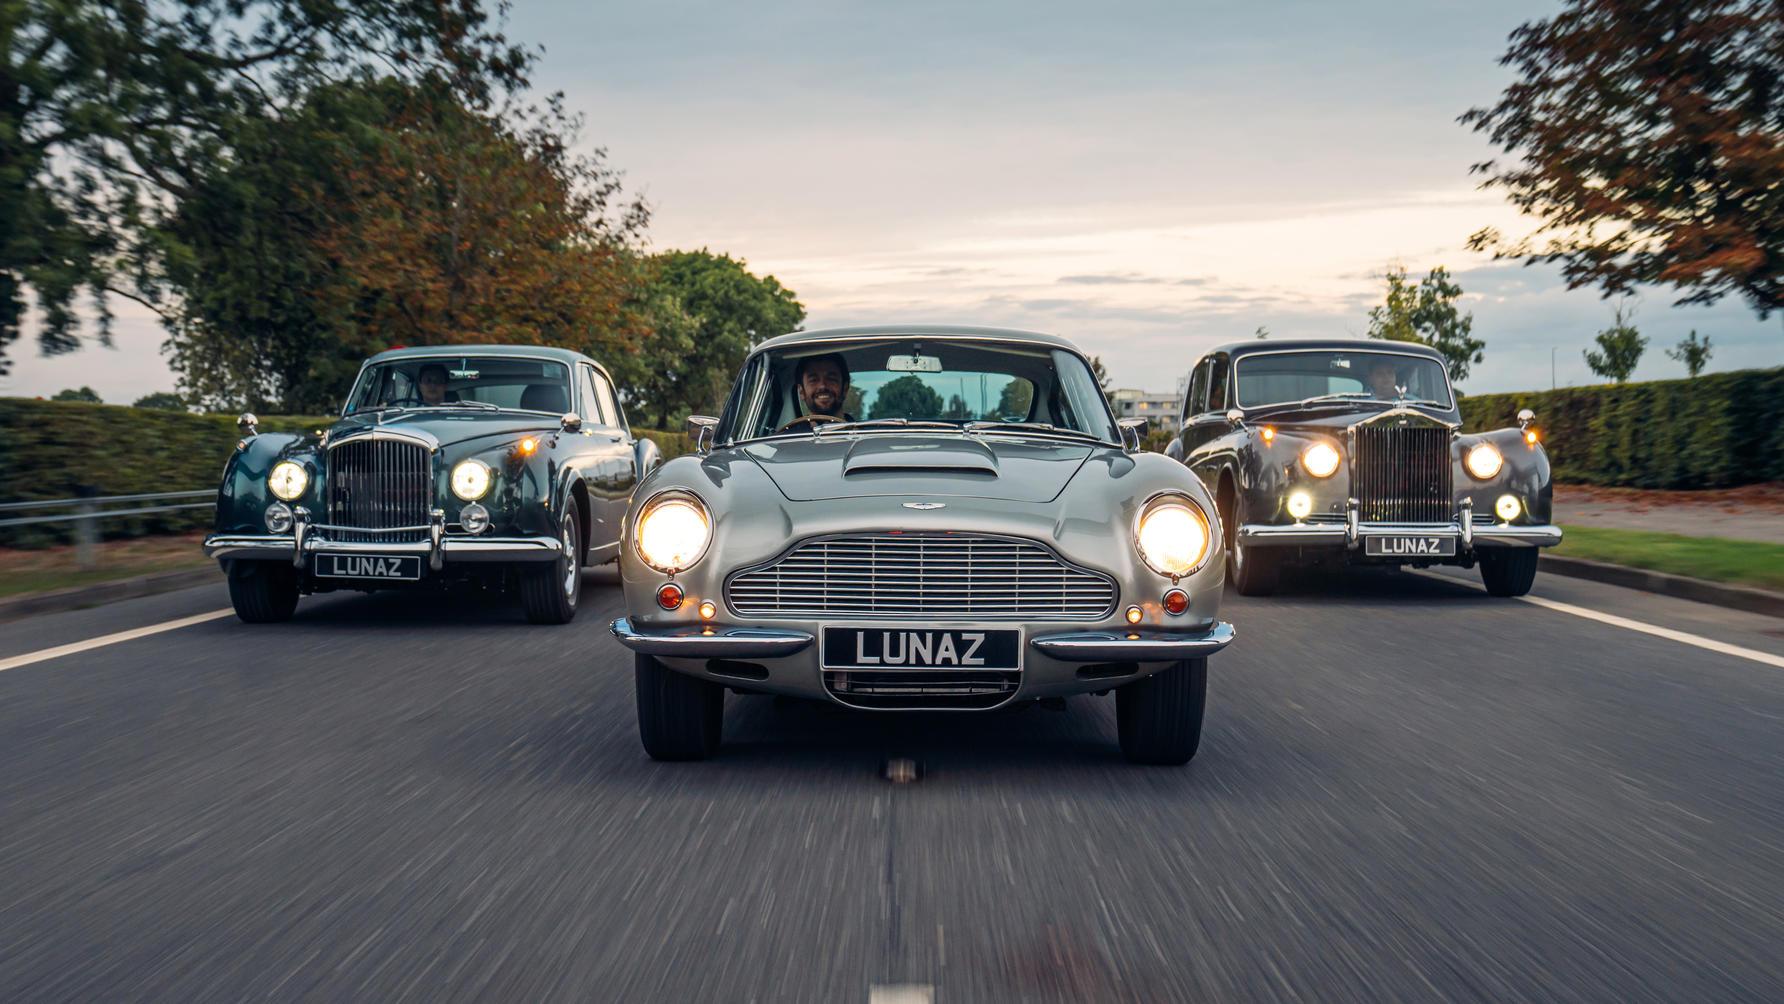 Lunaz electric Aston Martin DB6 Top Gear 2021